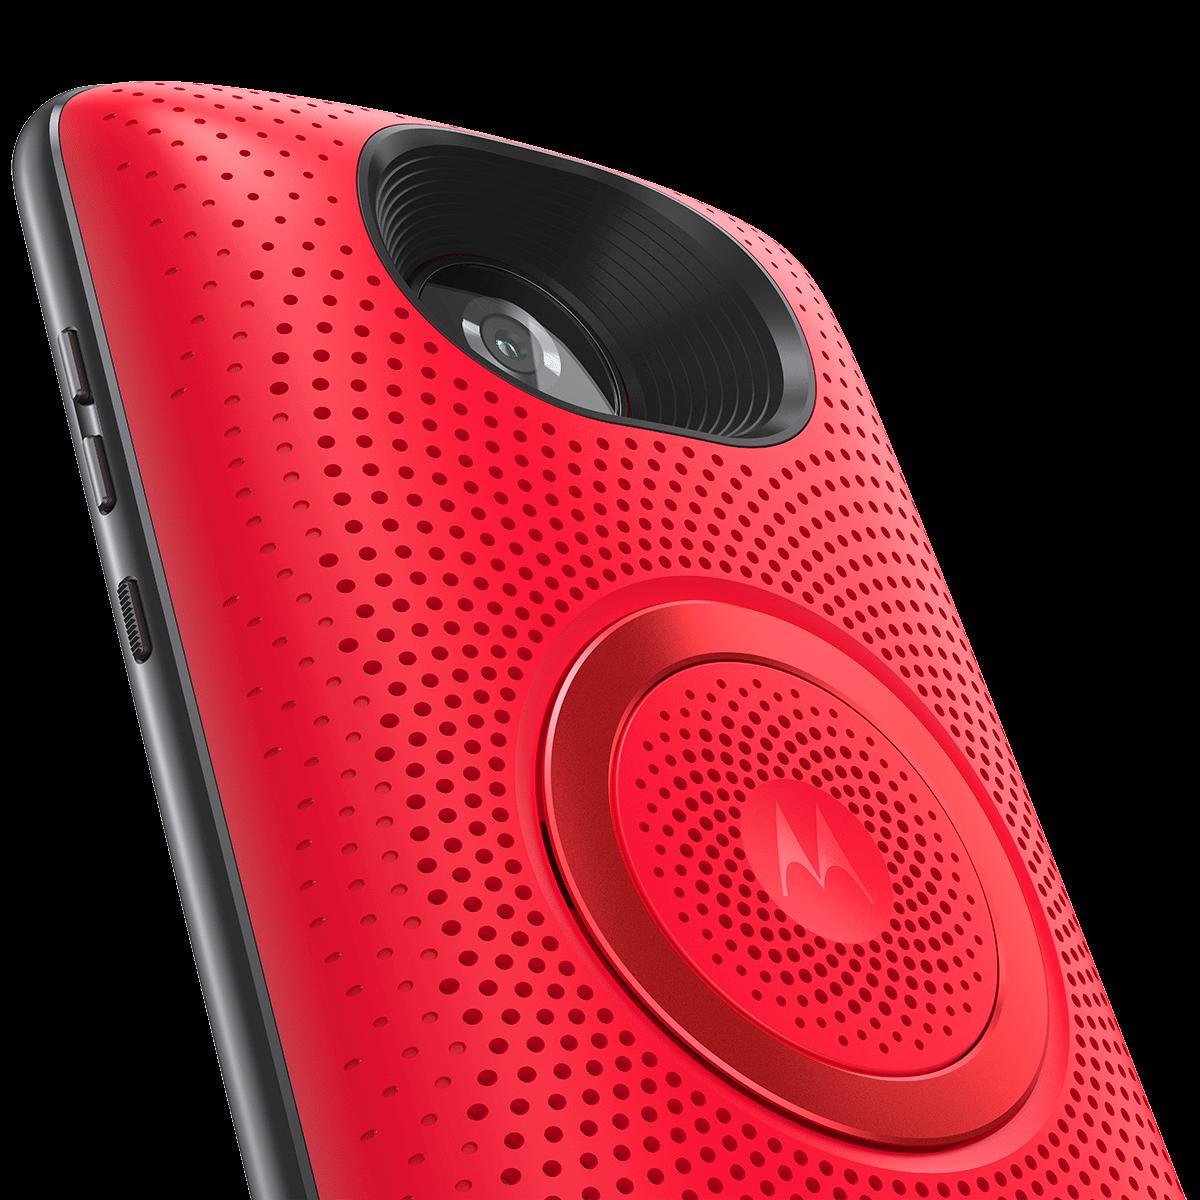 Motorola lança Snap de alto-falante estéreo por R$ 399,00